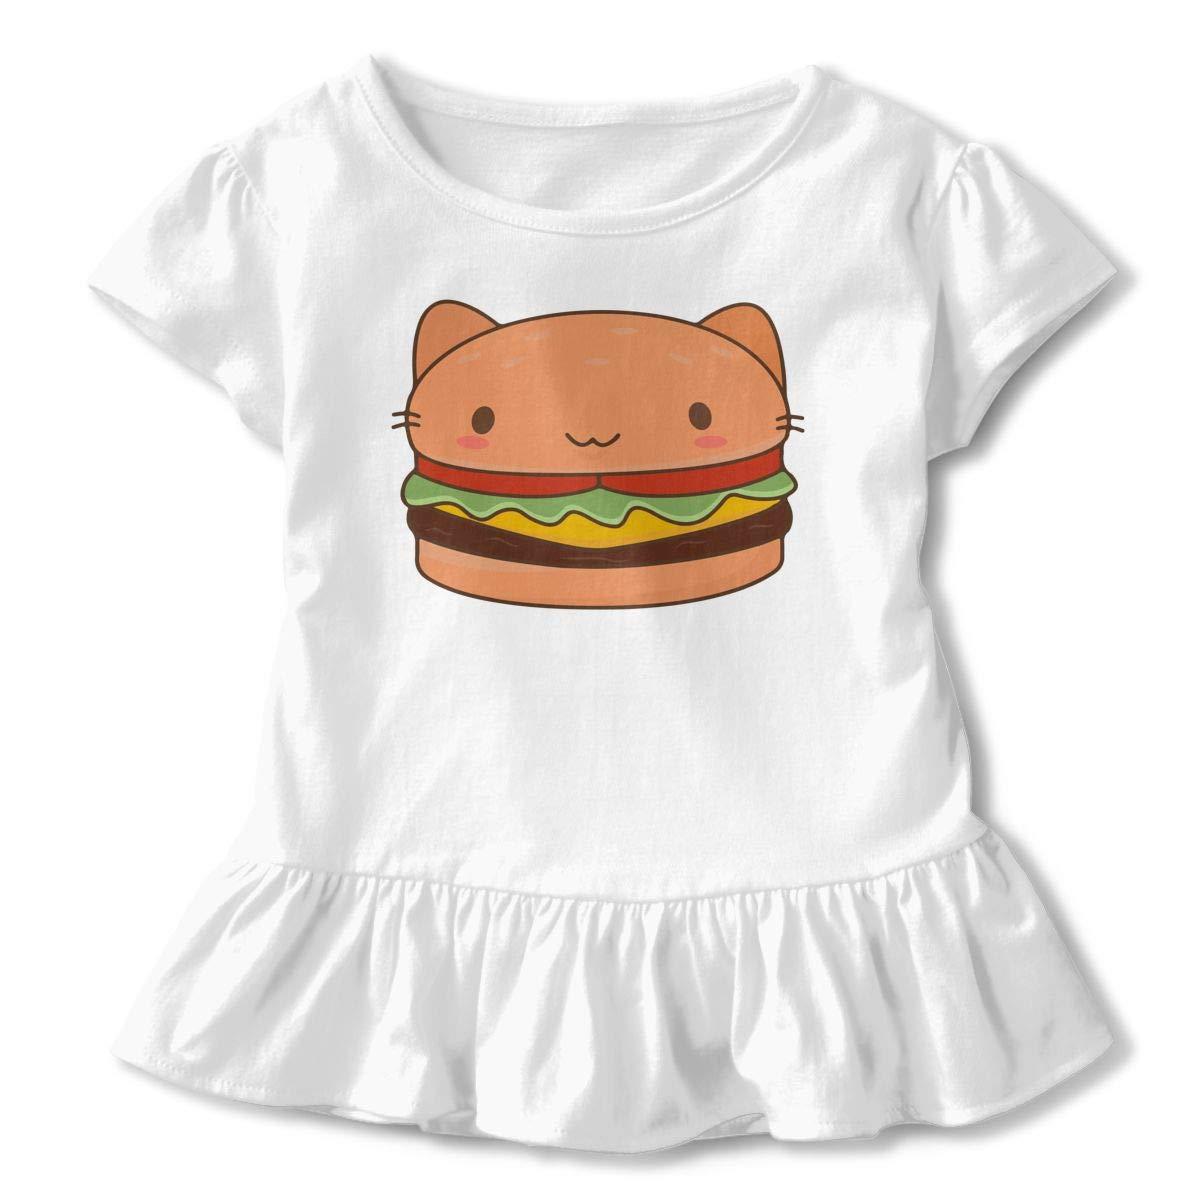 Toddler Baby Girl Kawaii Cat Burger Funny Short Sleeve Cotton T Shirts Basic Tops Tee Clothes